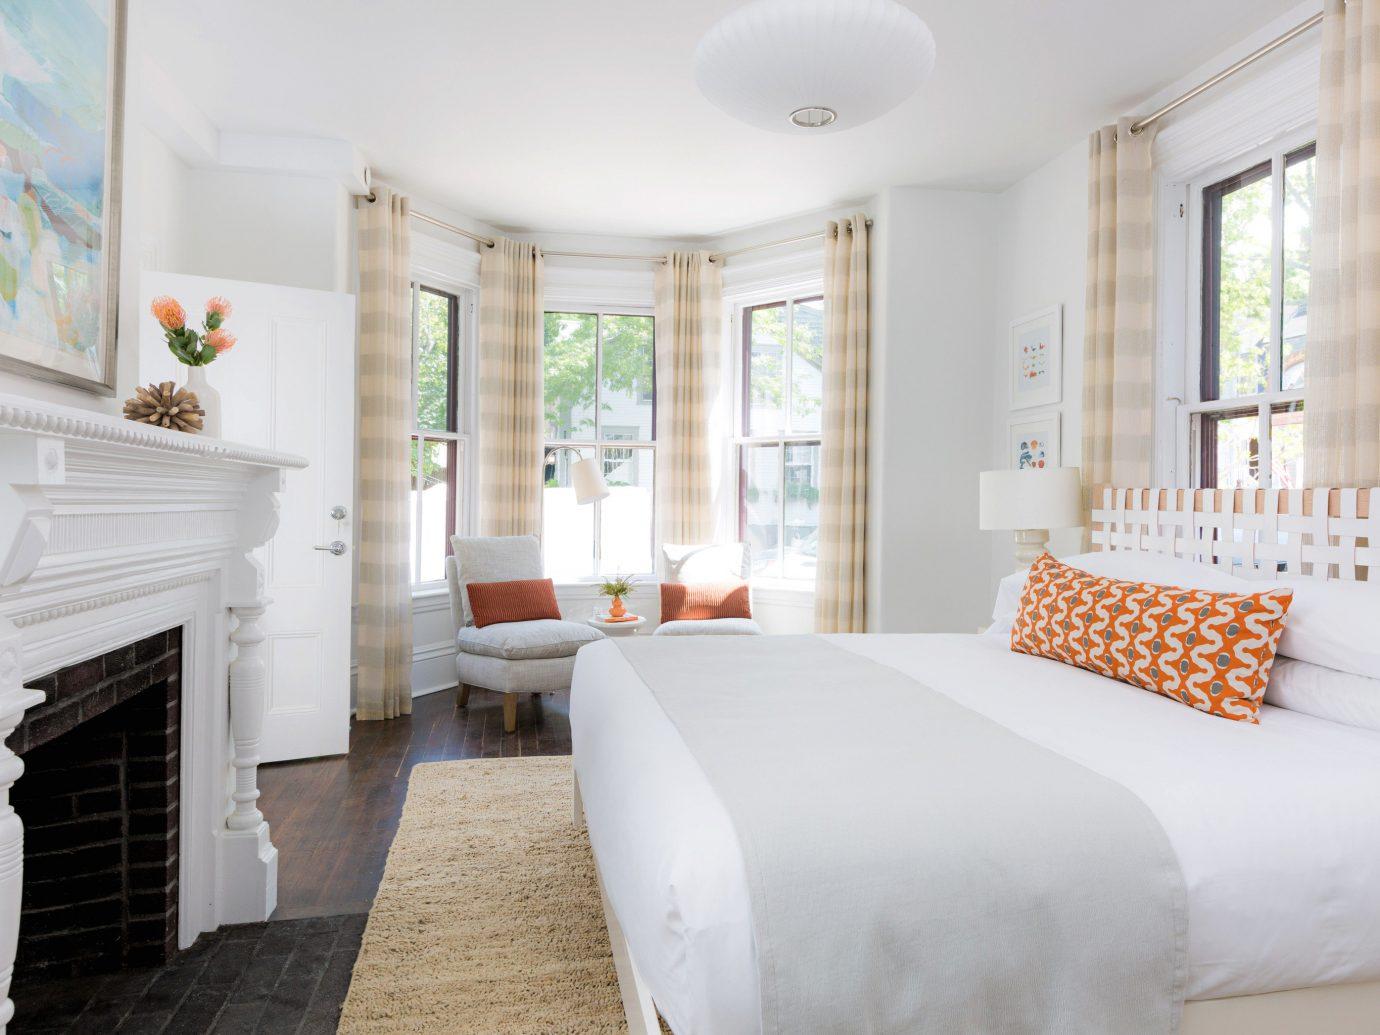 21 Broad Hotel, Nantucket